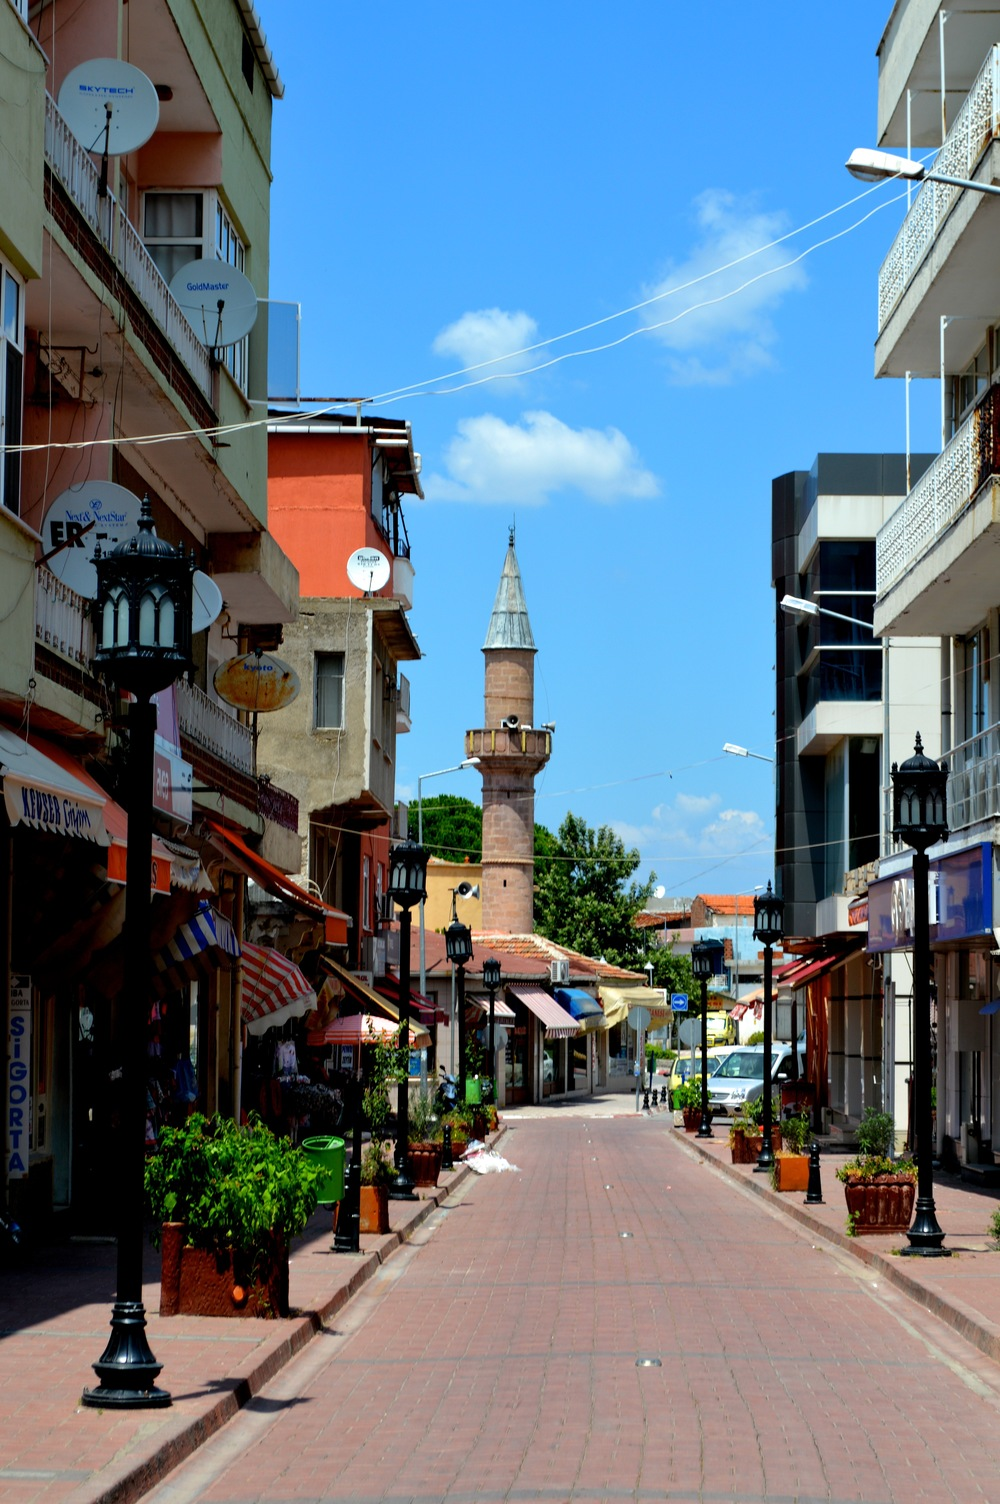 Downtown Ezine